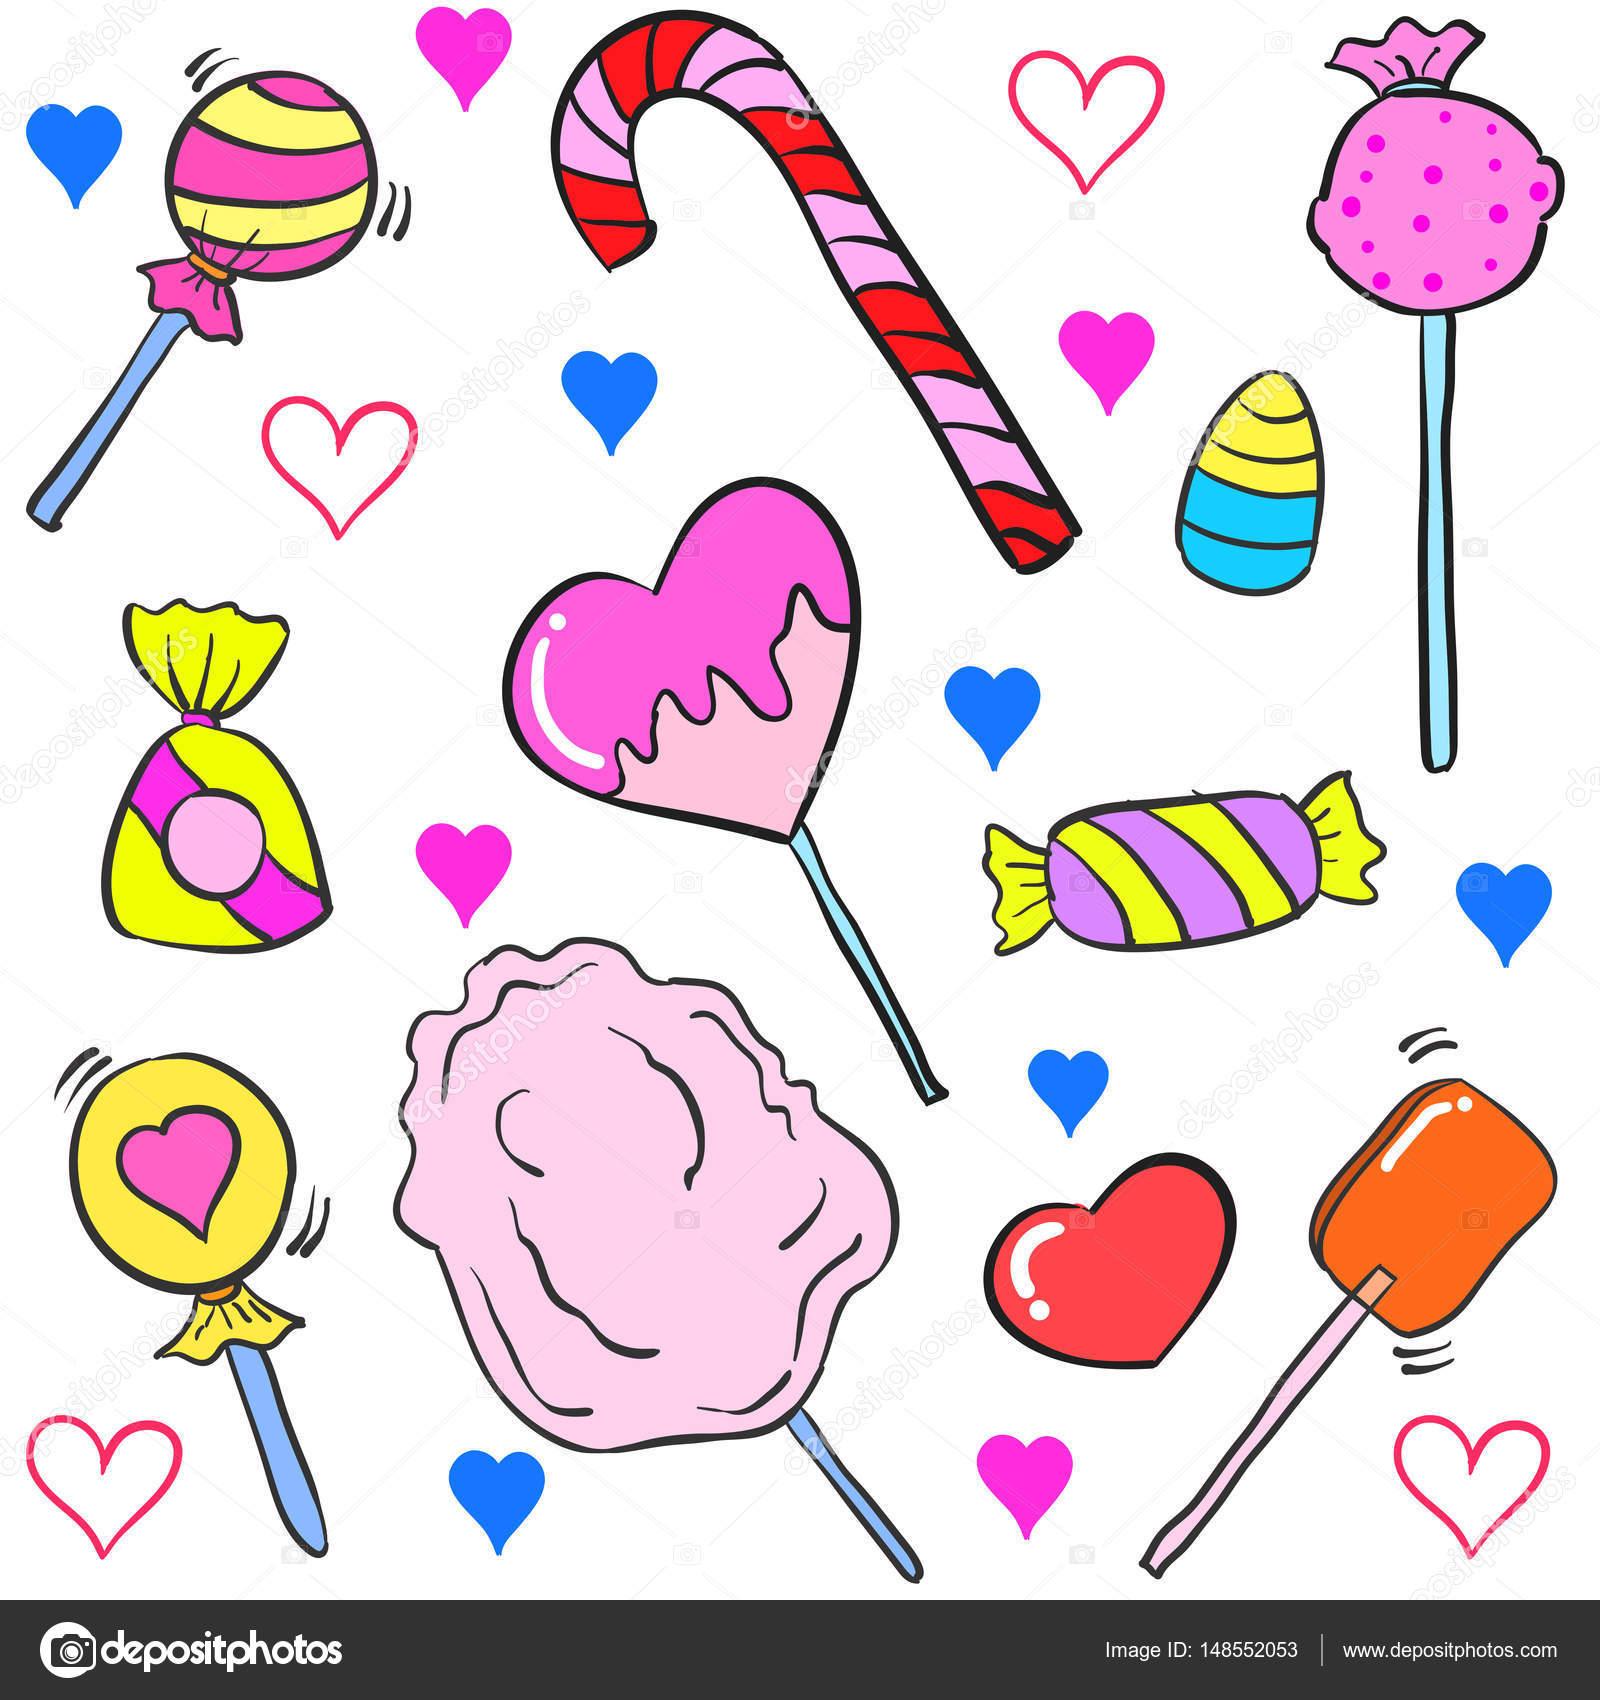 Garabato De Vario Estilo De Dibujos Animados Coloridos Dulces